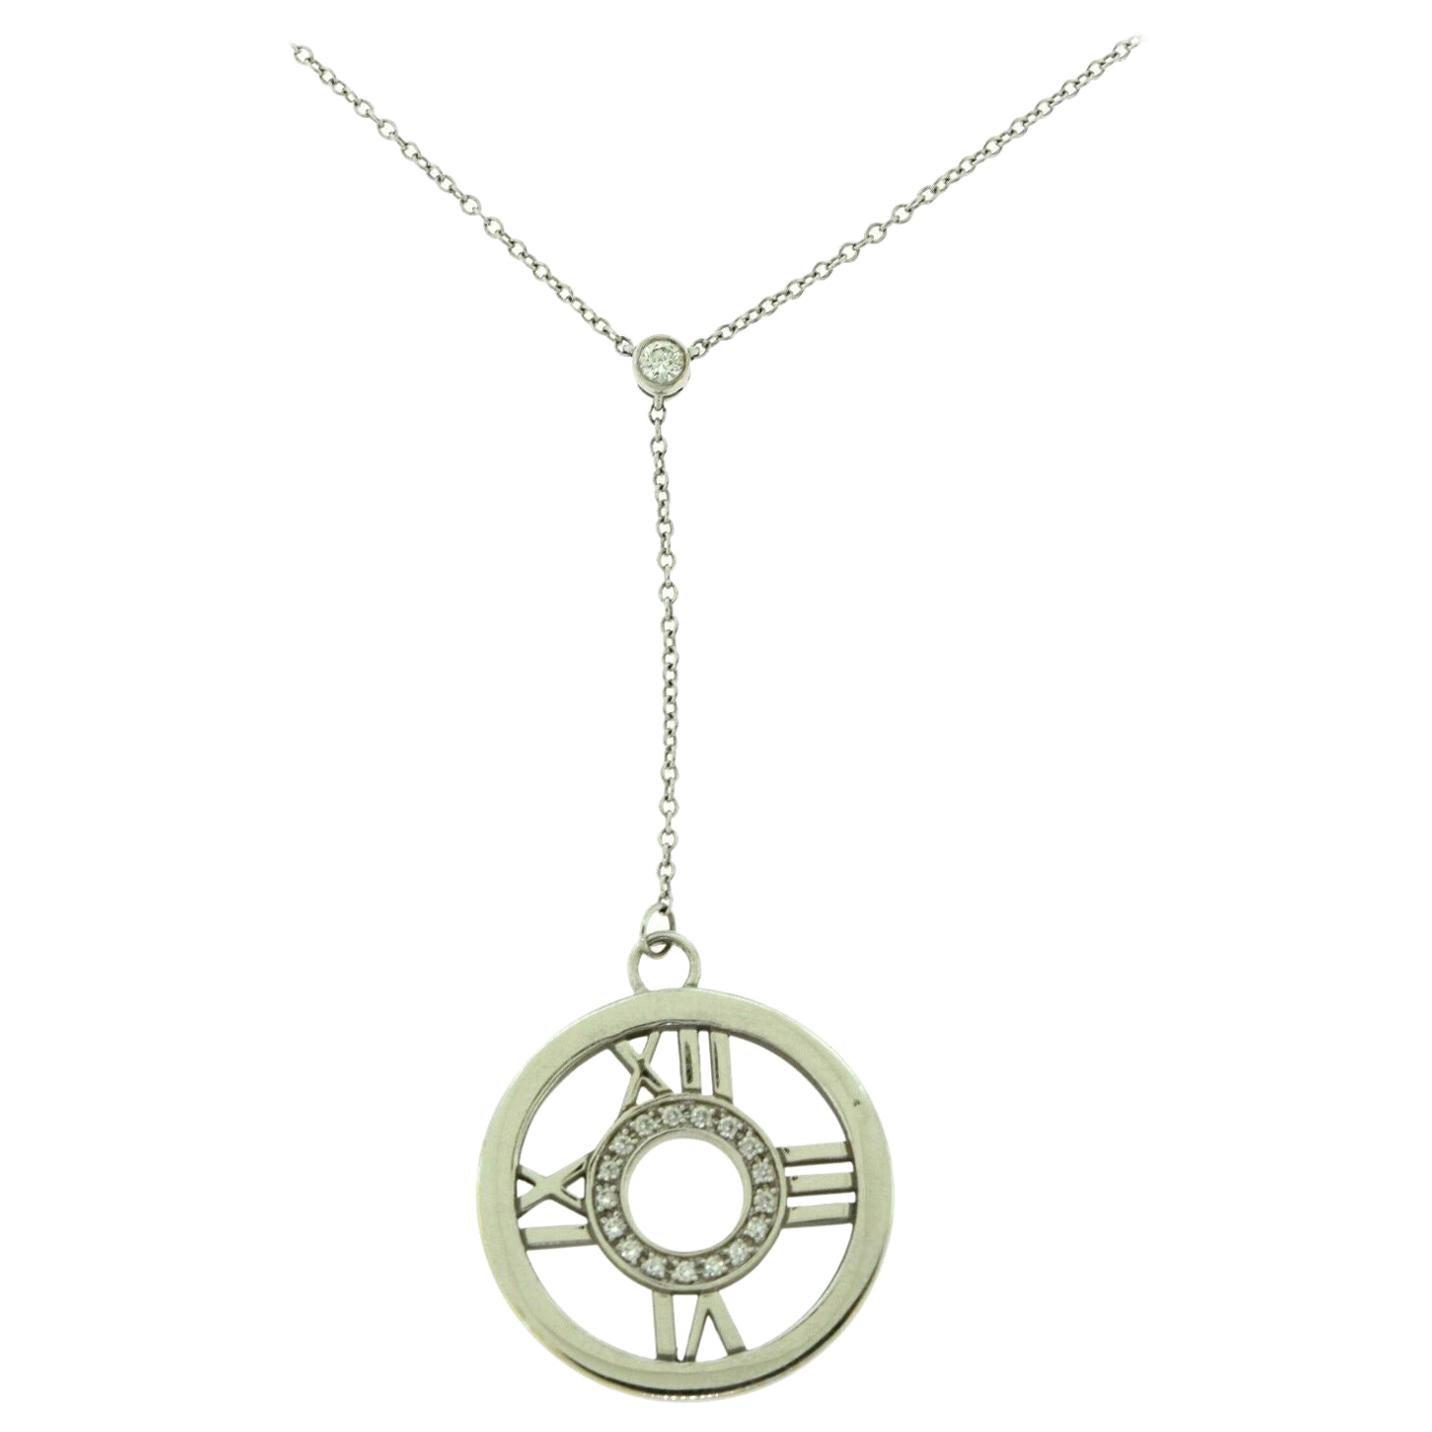 Tiffany & Co. Tiffany Atlas Diamond Circle Roman Numeral Gold Necklace Pendant